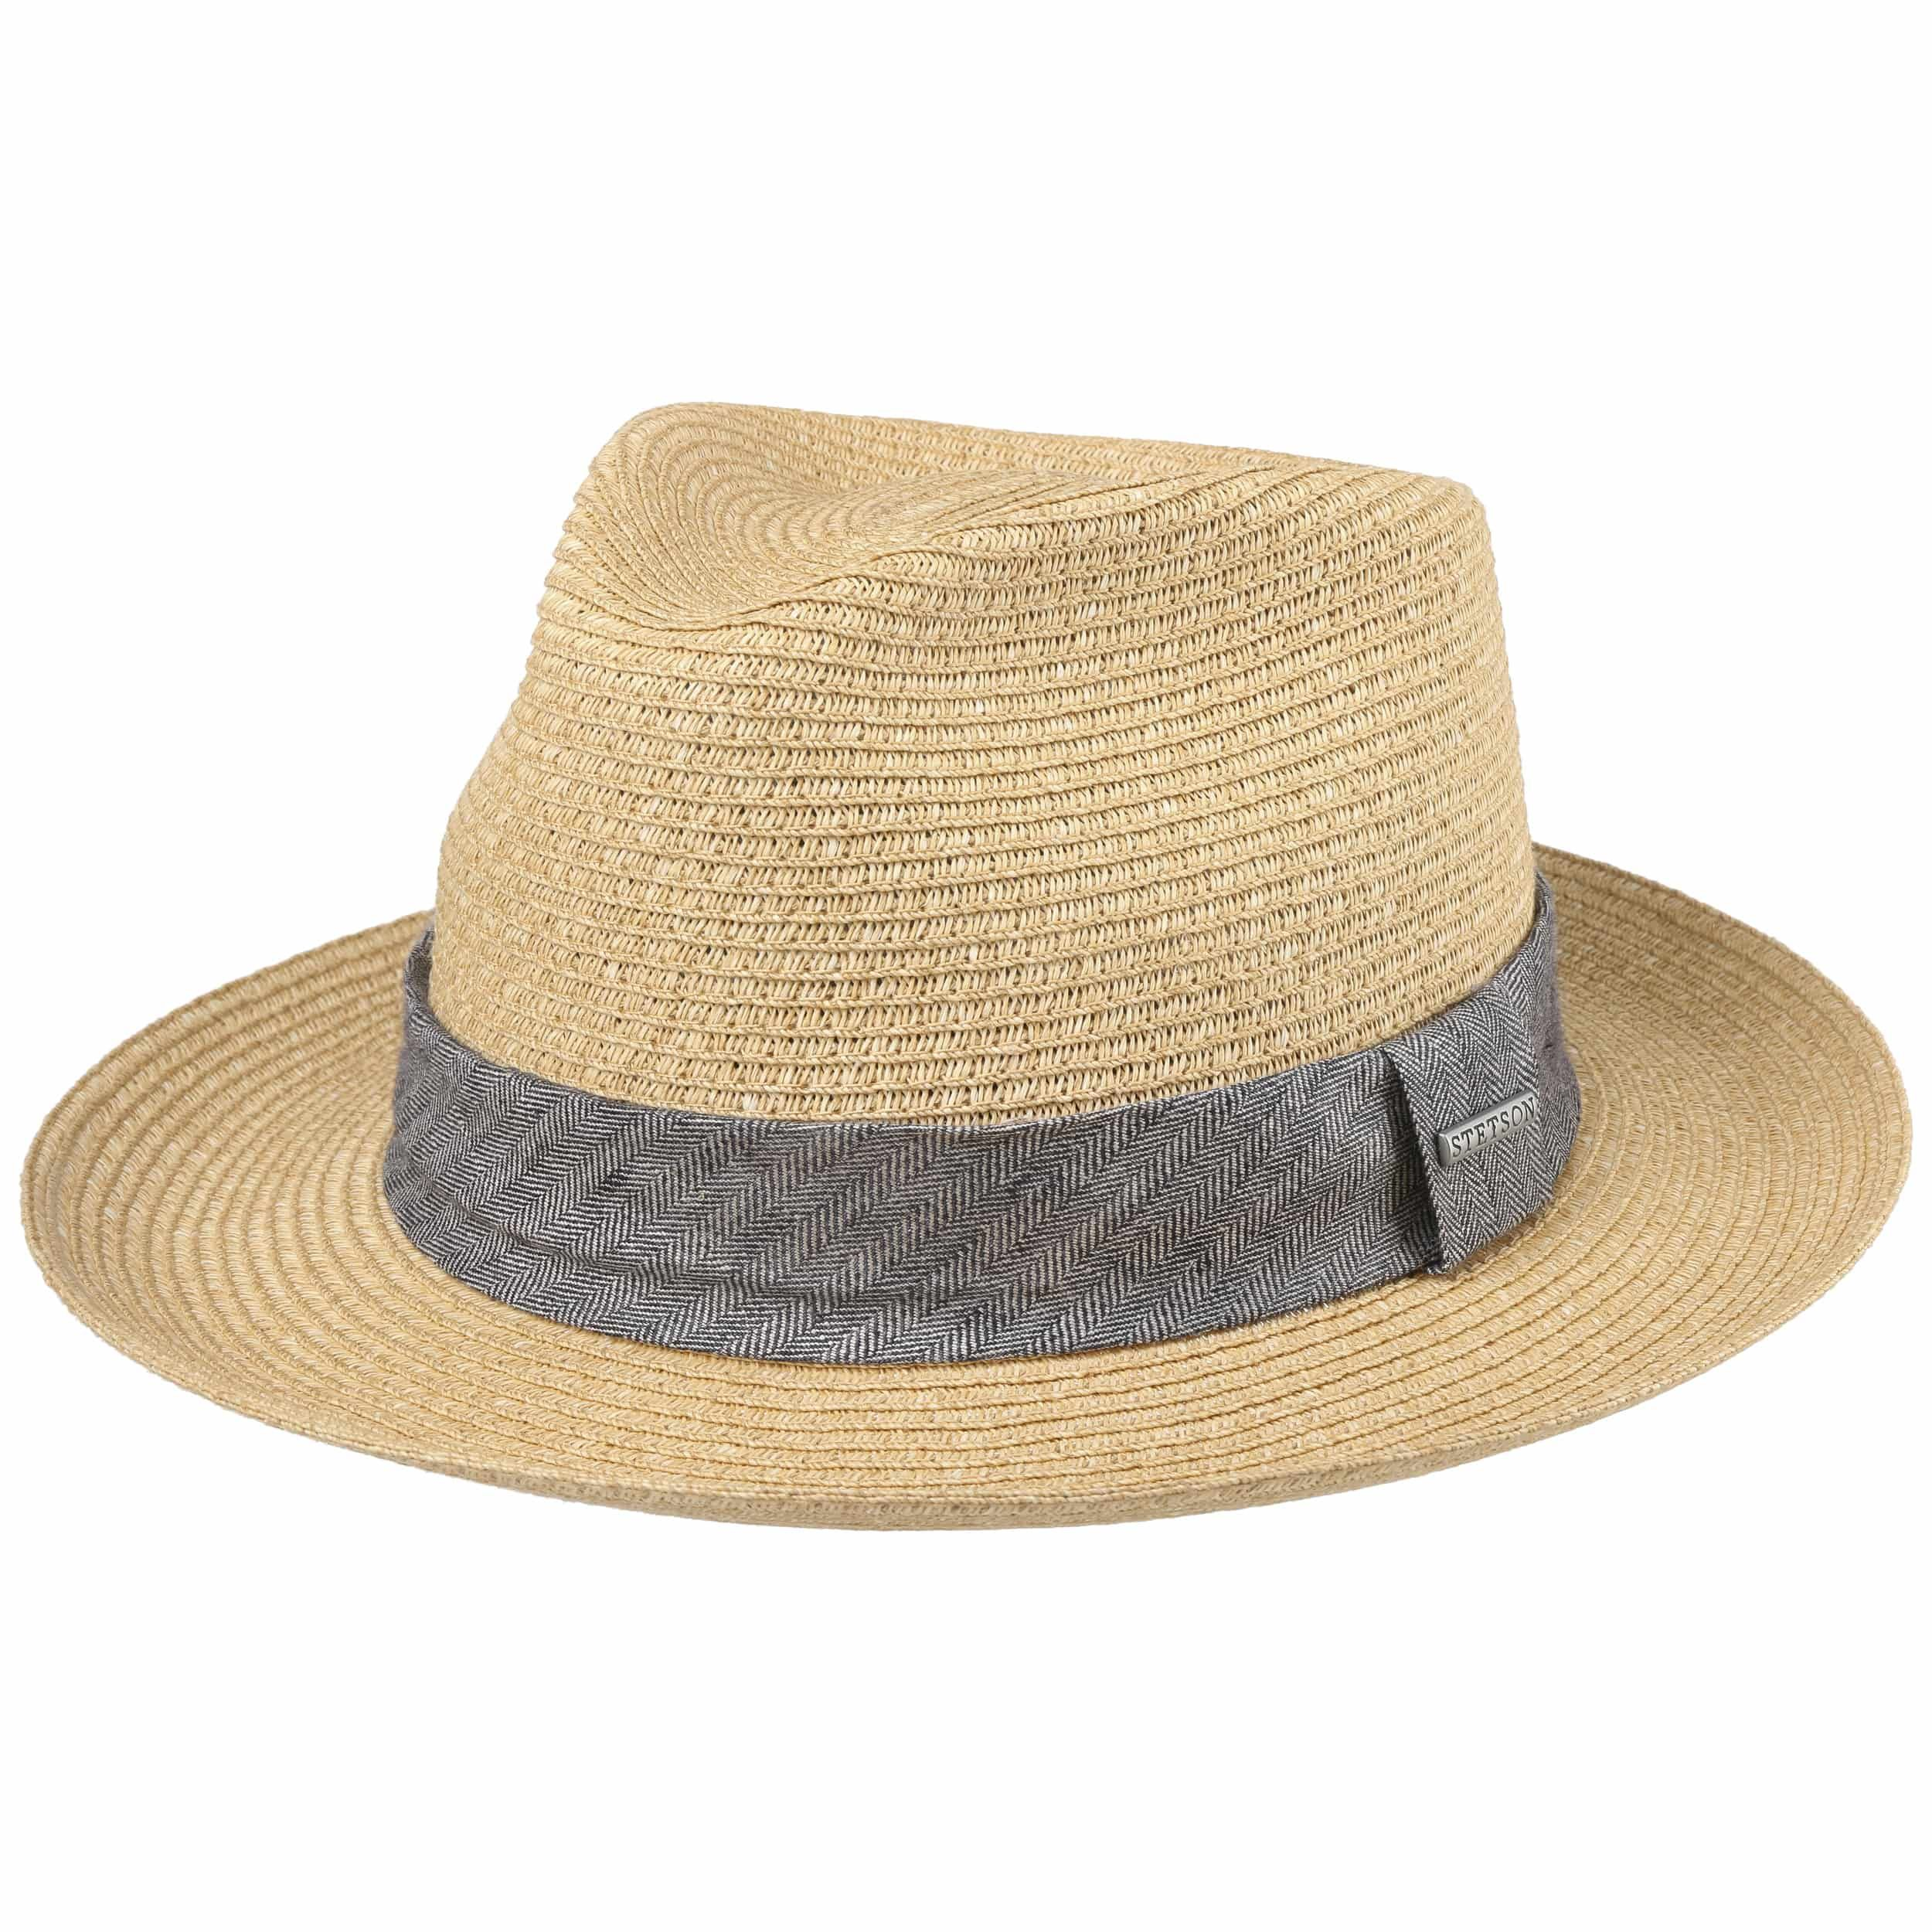 Lintano Toyo Straw Hat nature